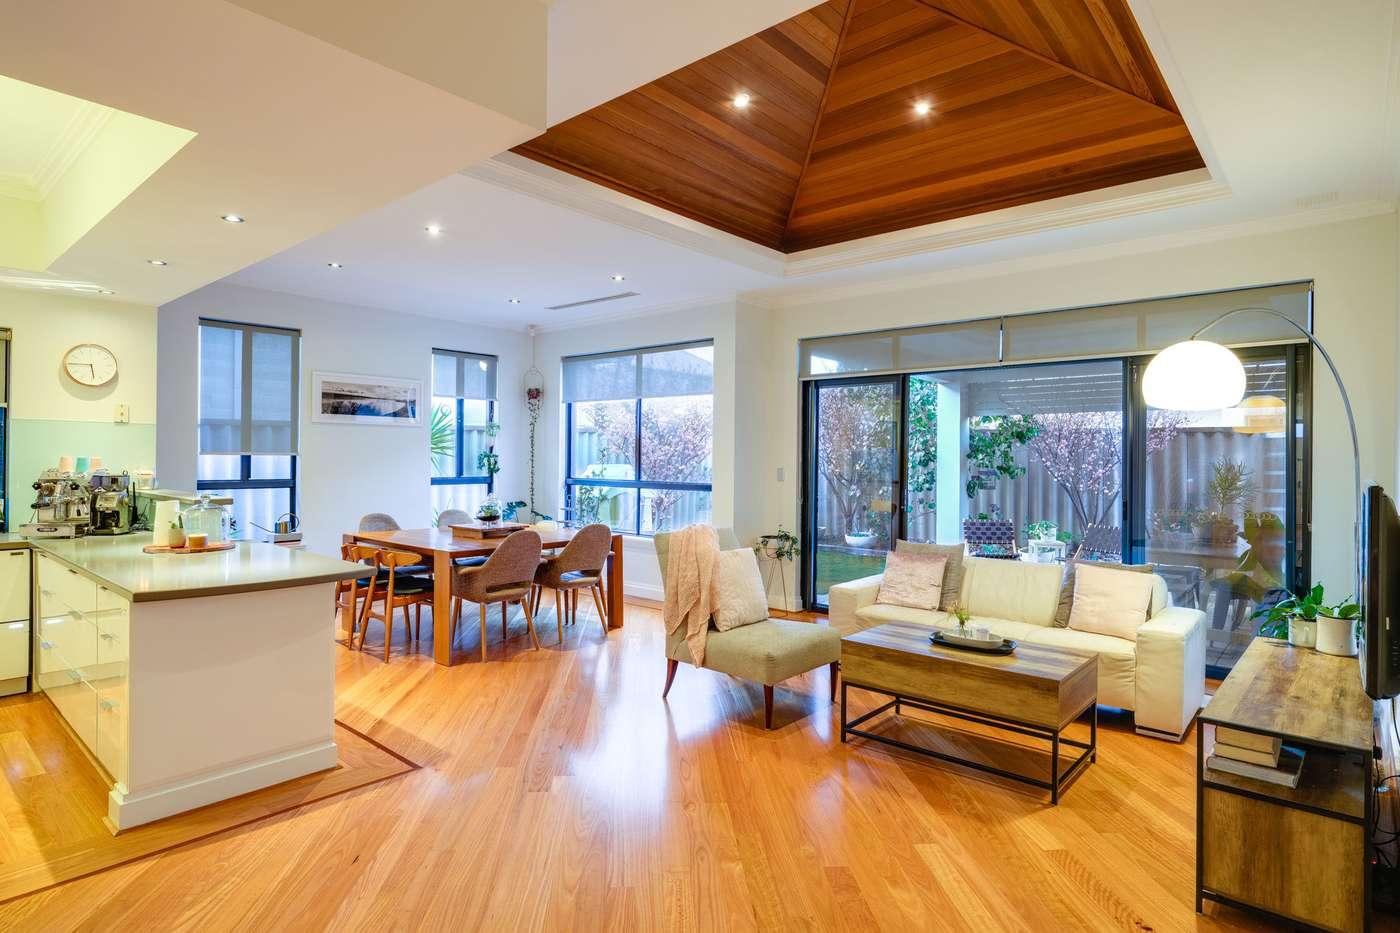 Main view of Homely house listing, 23 Sandrigo Way, Stirling, WA 6021